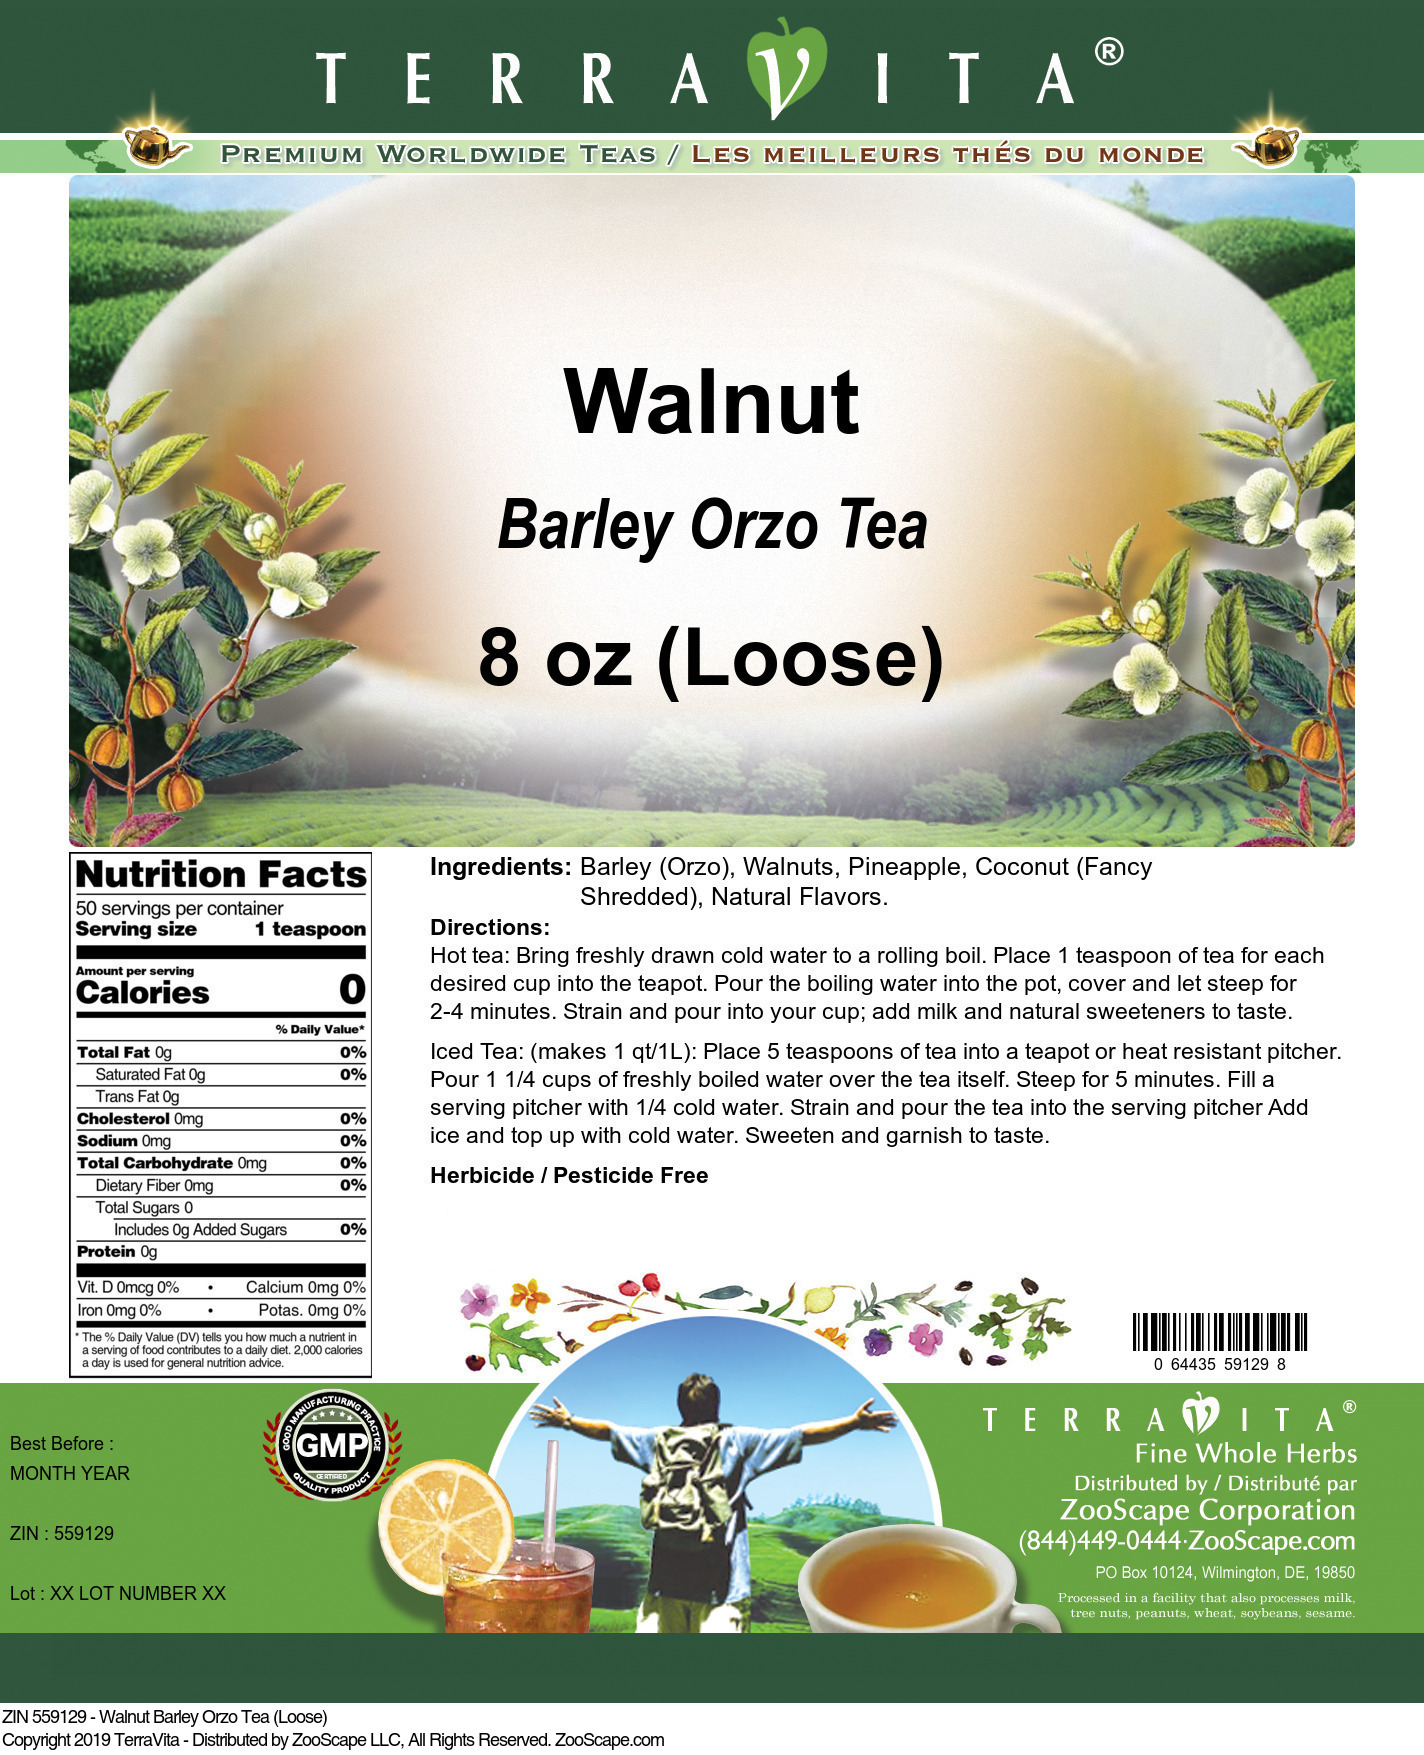 Walnut Barley Orzo